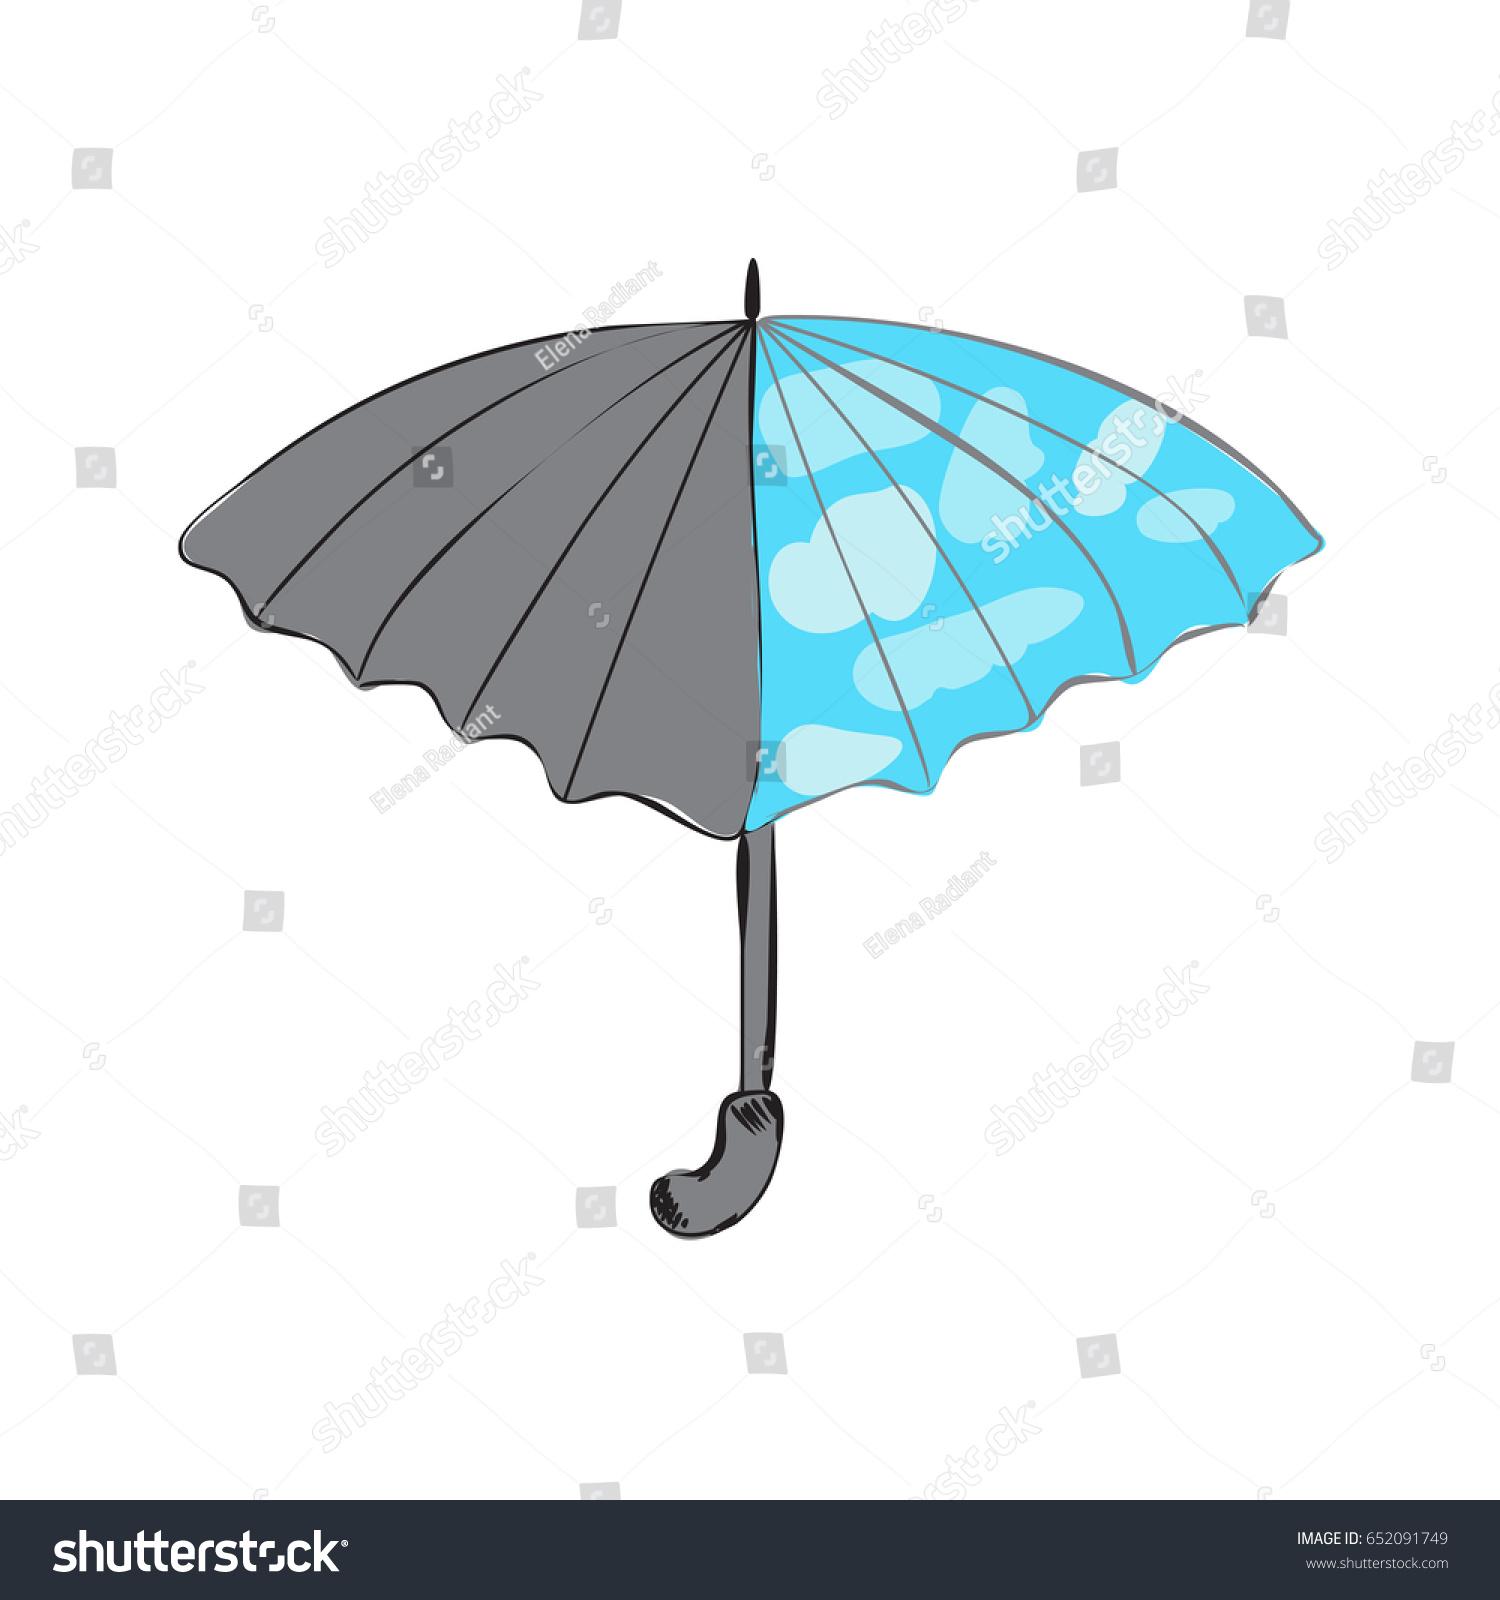 Unusual Umbrella Abstraction Clouds Stock Vector 652091749 ...